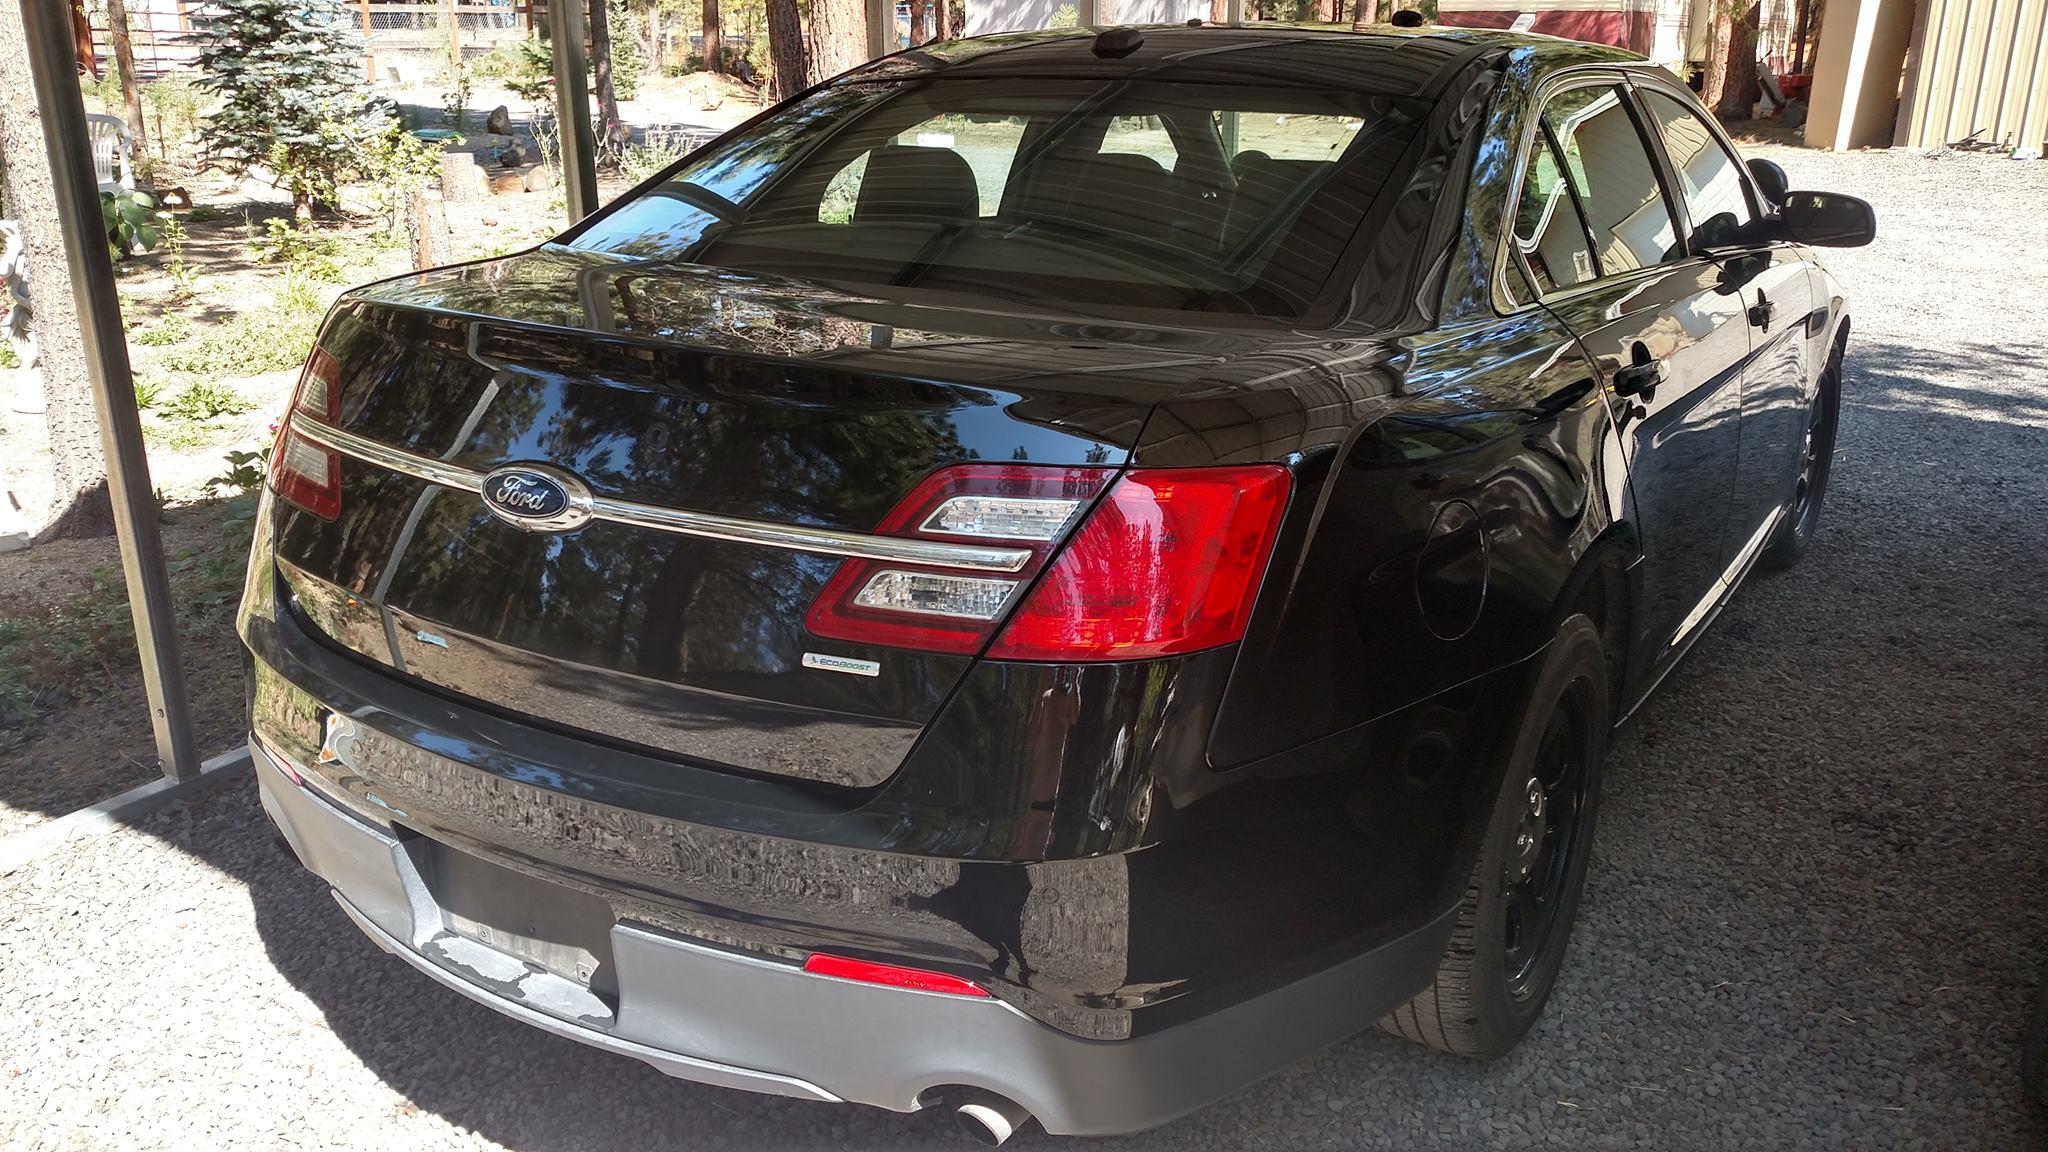 awd  ford interceptor sedan  twin turbo ecoboost interceptor king